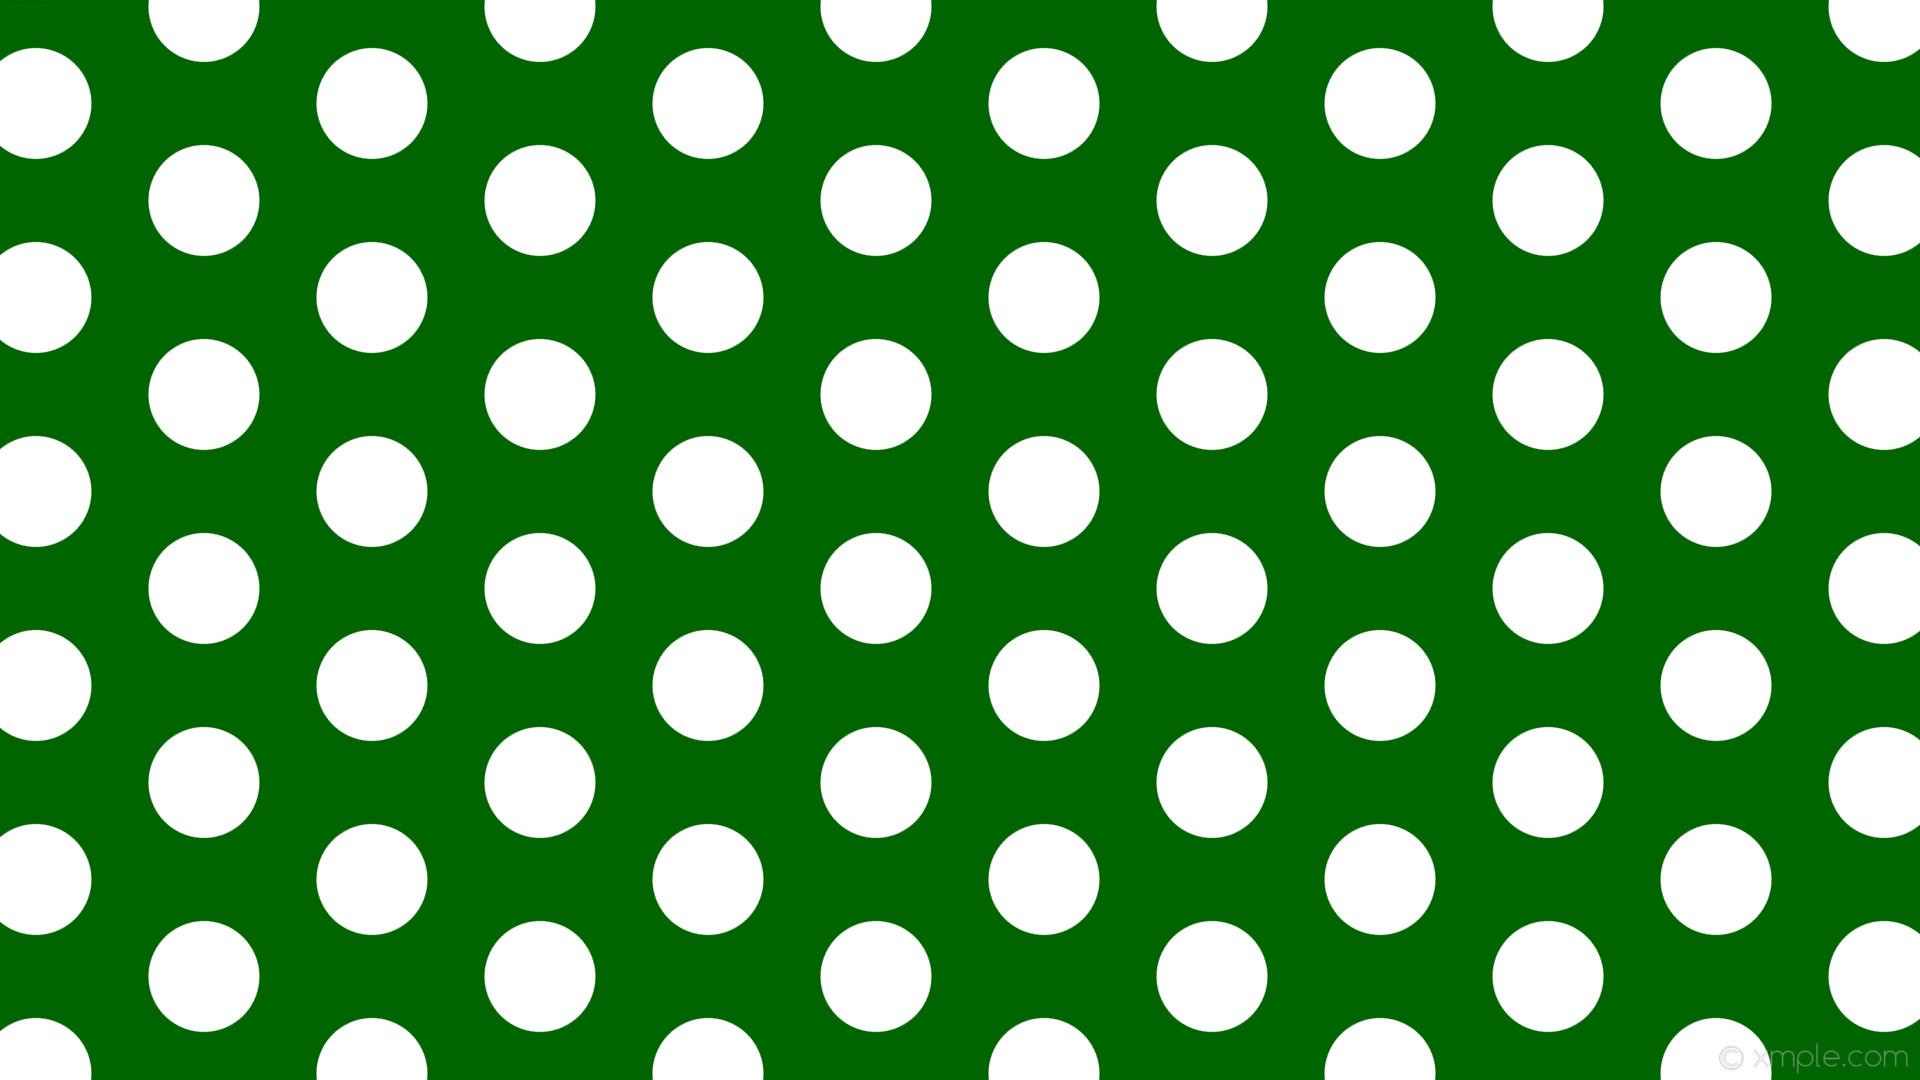 wallpaper white polka dots hexagon green dark green #006400 #ffffff  diagonal 30° 111px